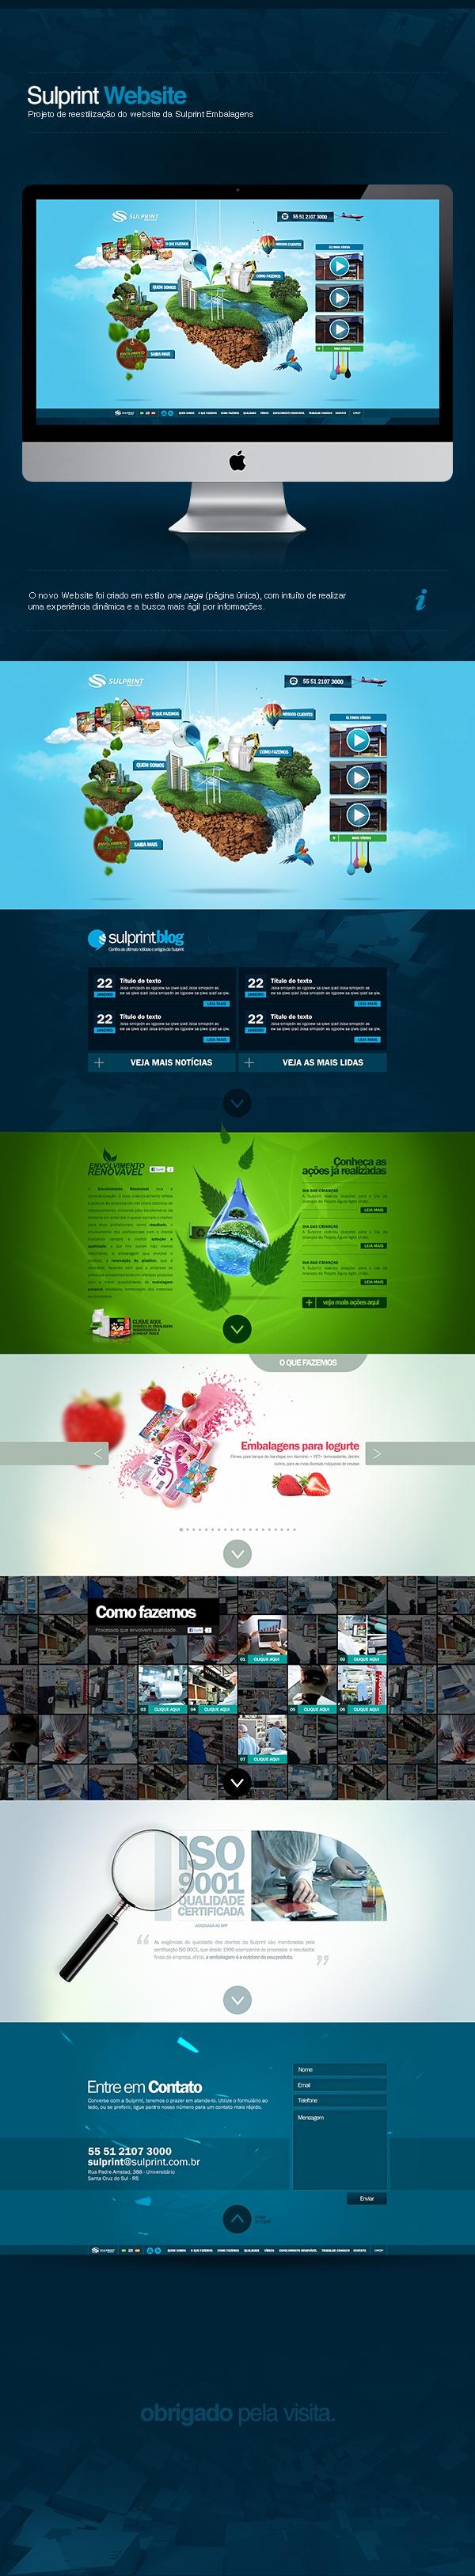 Website Sulprint Embalagens by Max Silva, via Behance